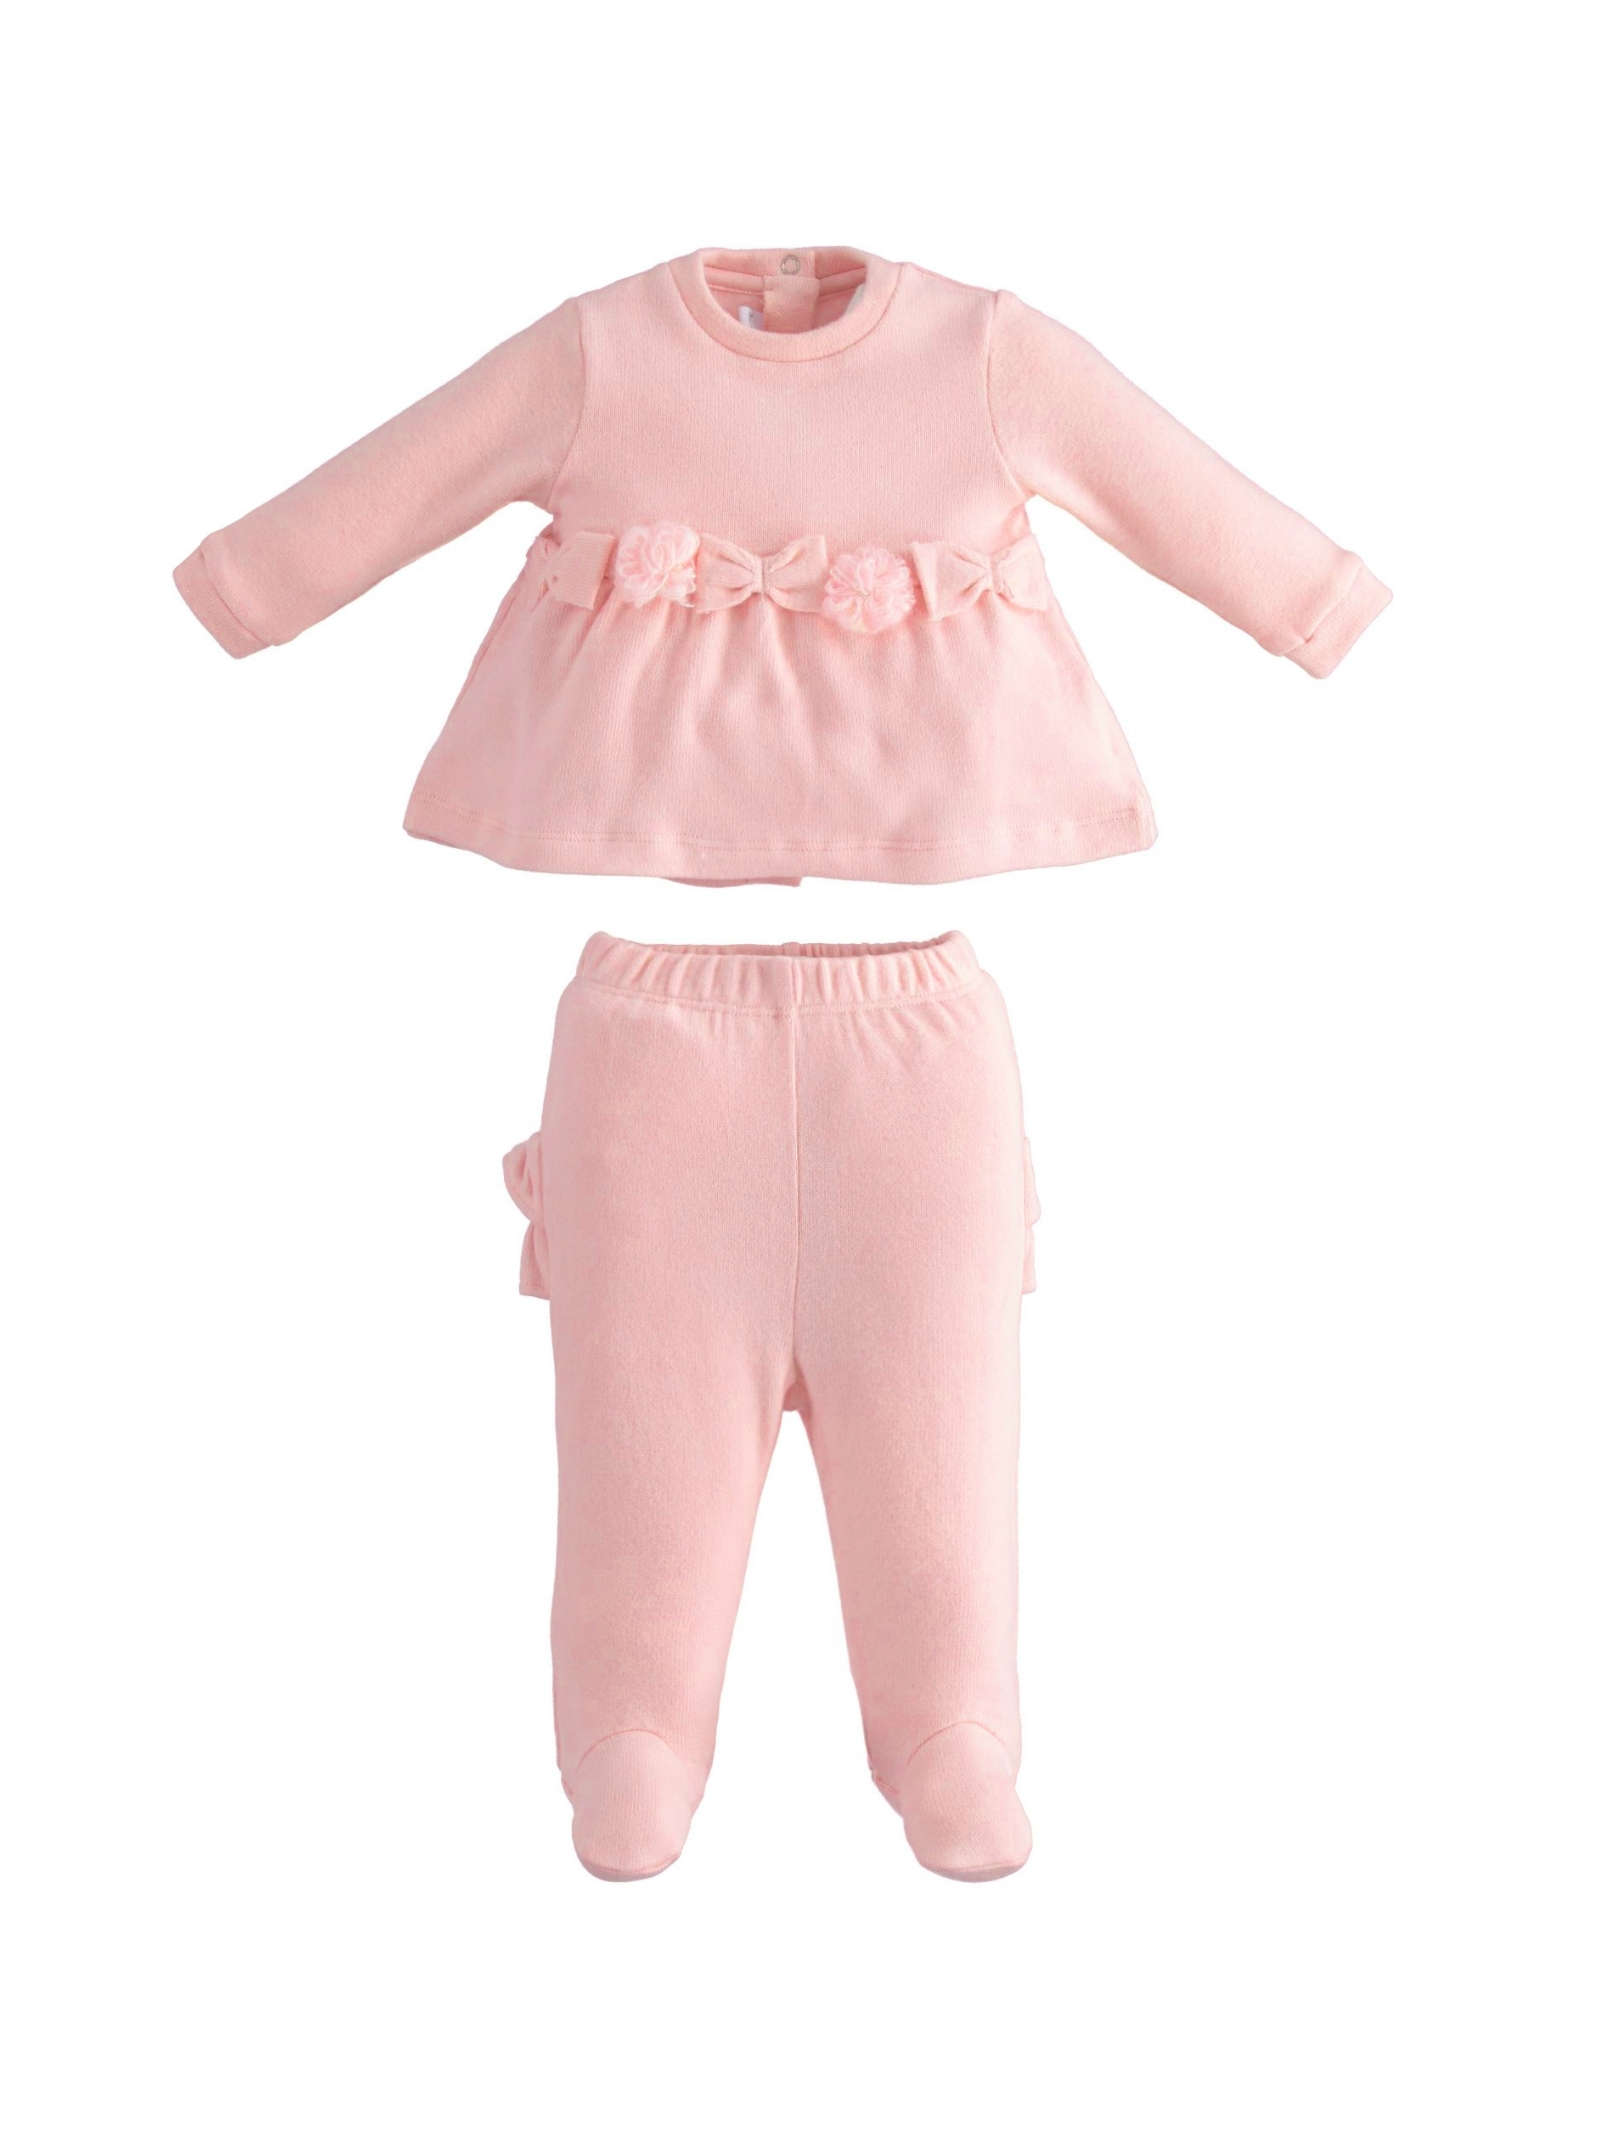 Two-Piece Baby Girl Romper MINIBANDA | Rompers | 33700002715